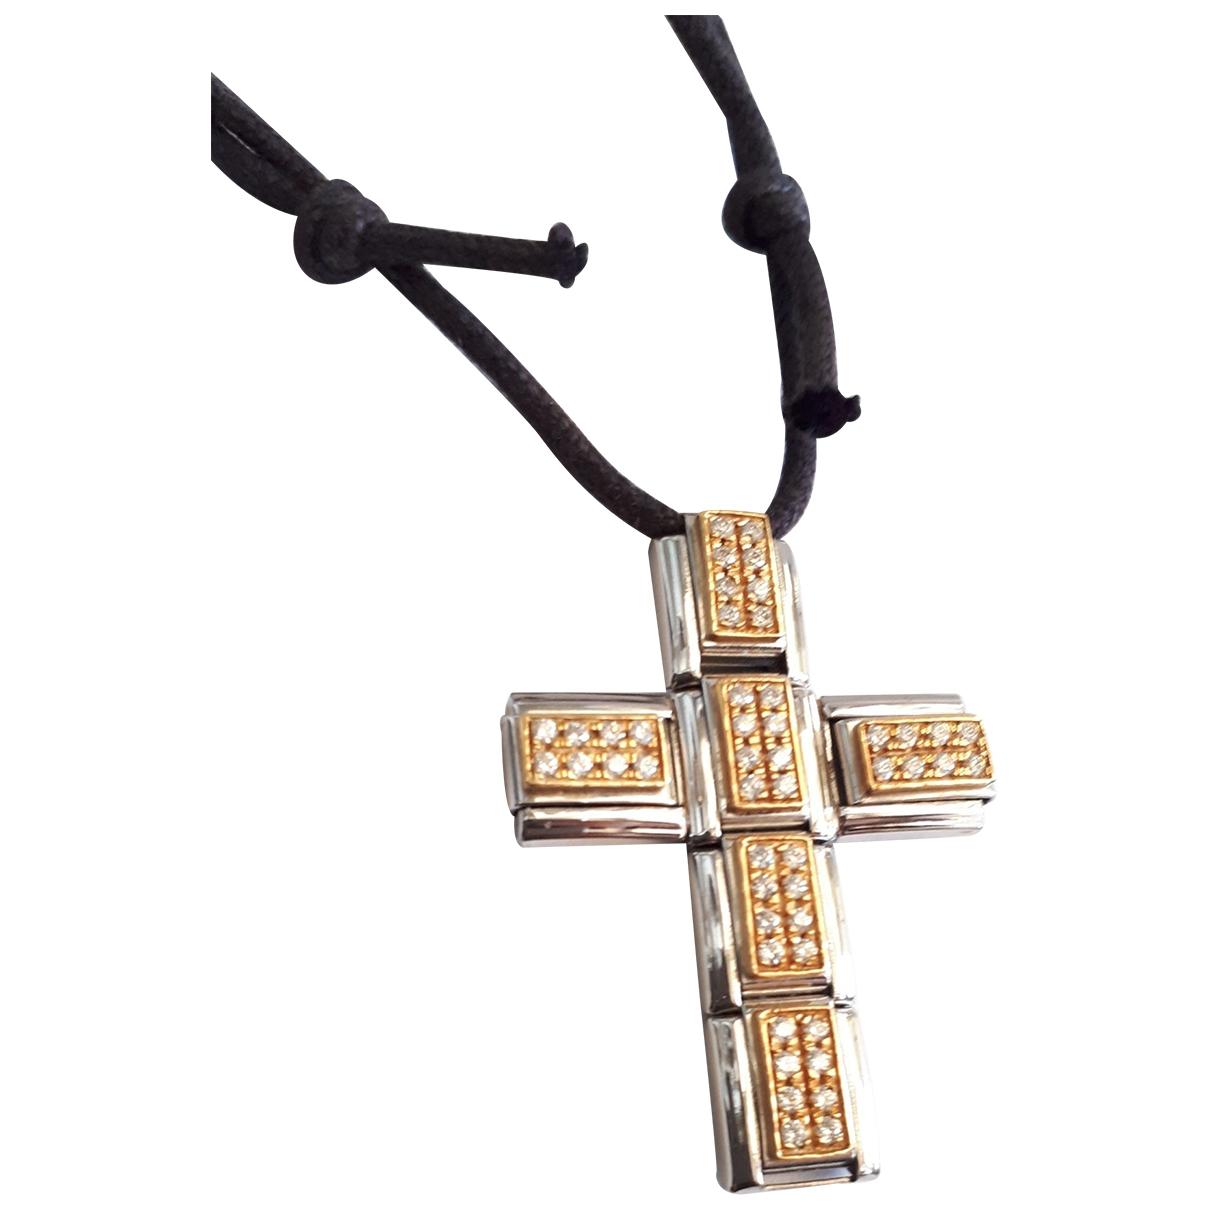 Non Signe / Unsigned Chaines Schmuckstuecke in  Silber Stahl